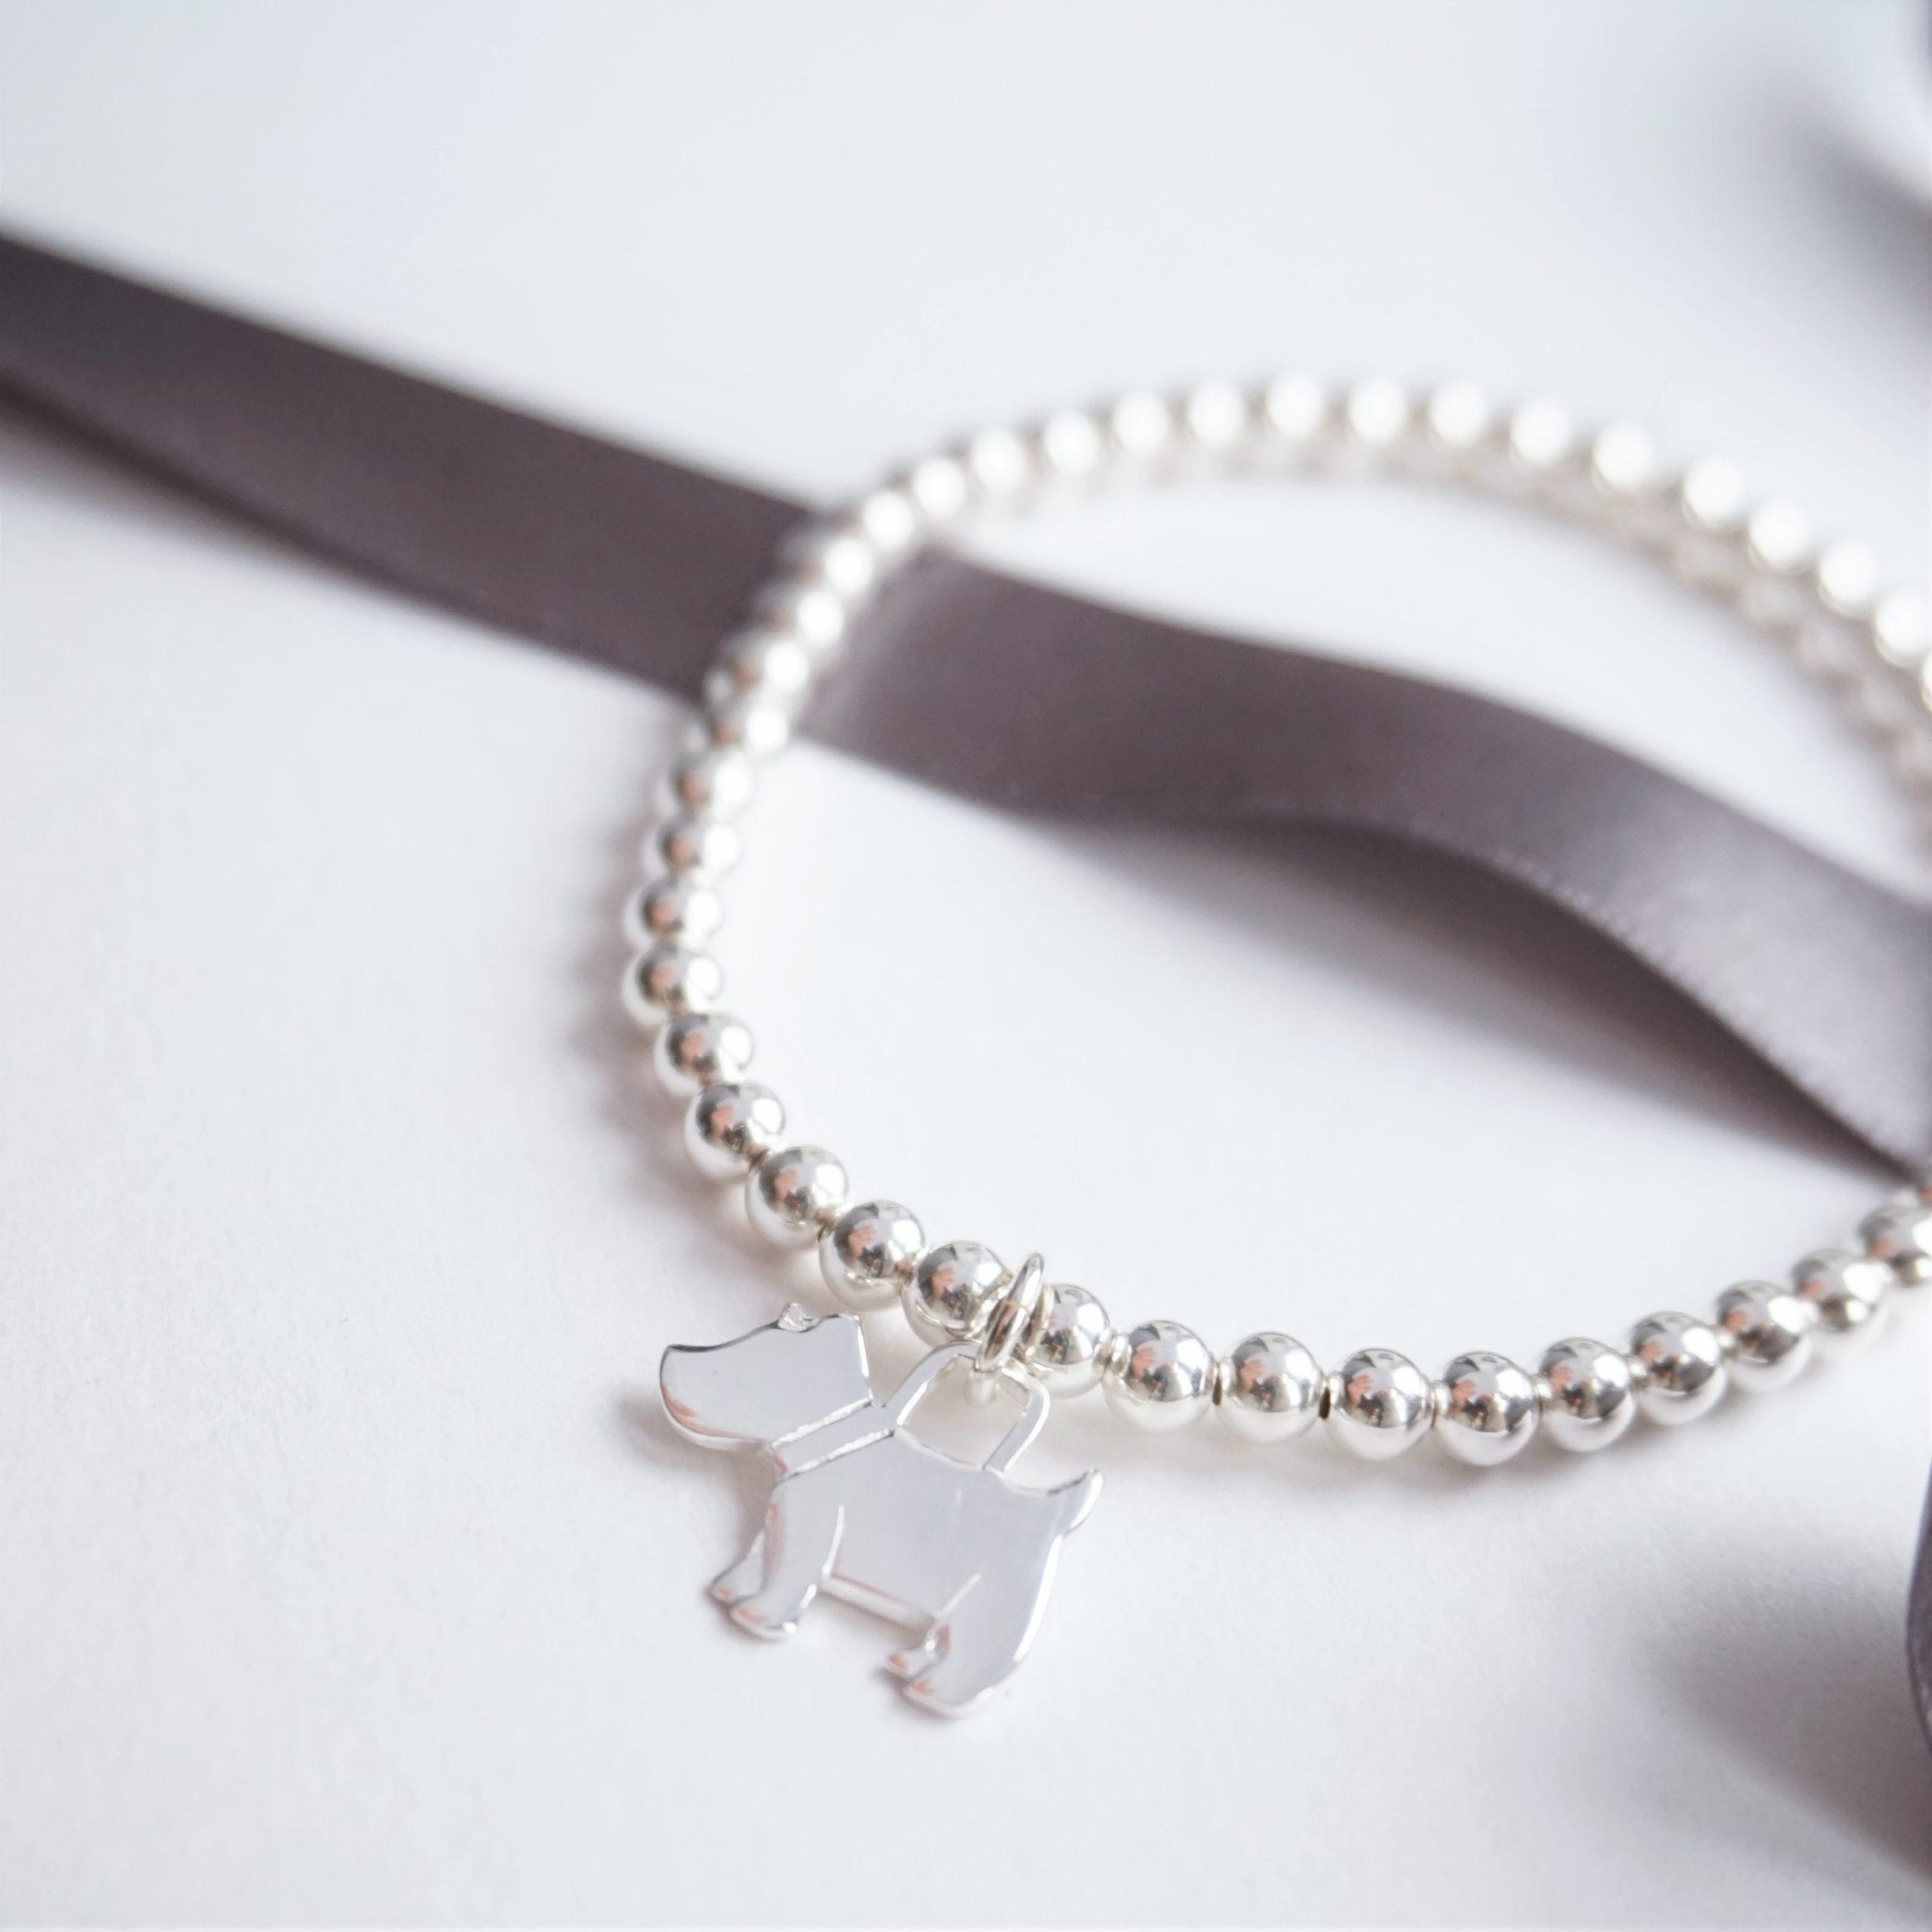 sterling silver bracelet with dog charm